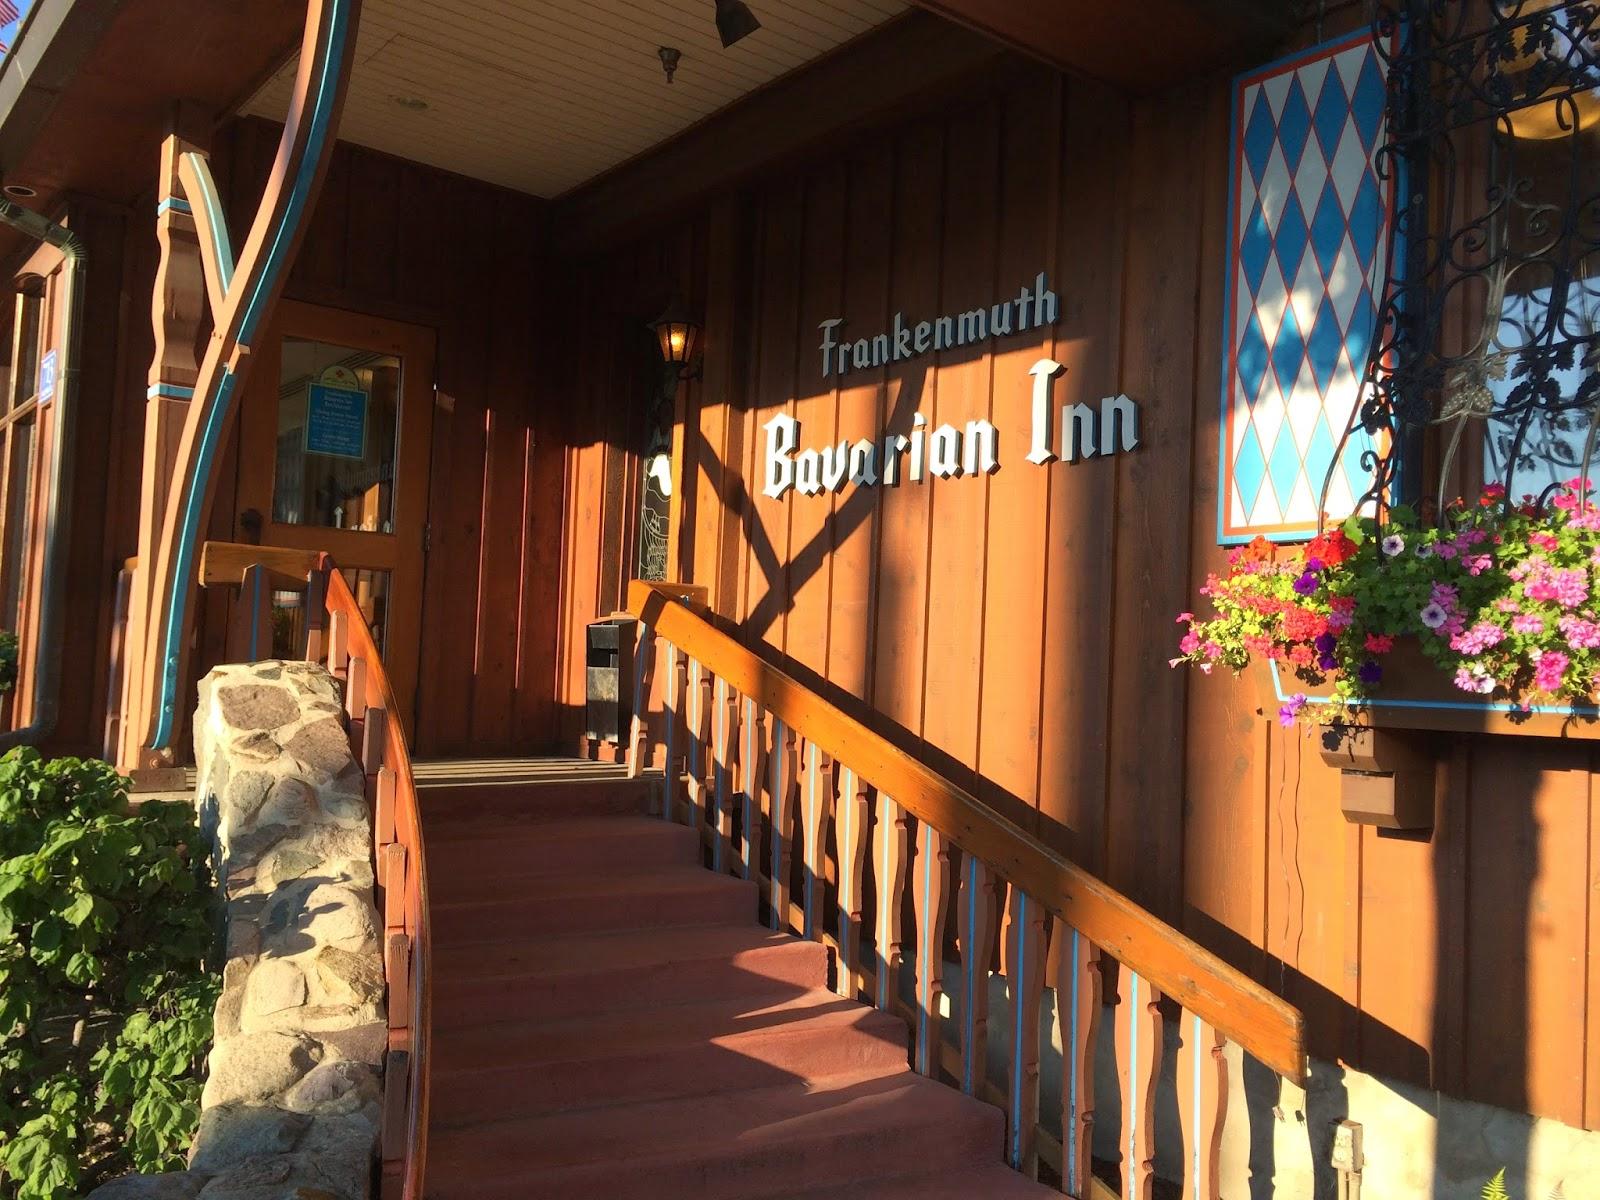 Bavarian Inn Restaurant Frankenmuth, Michigan MI